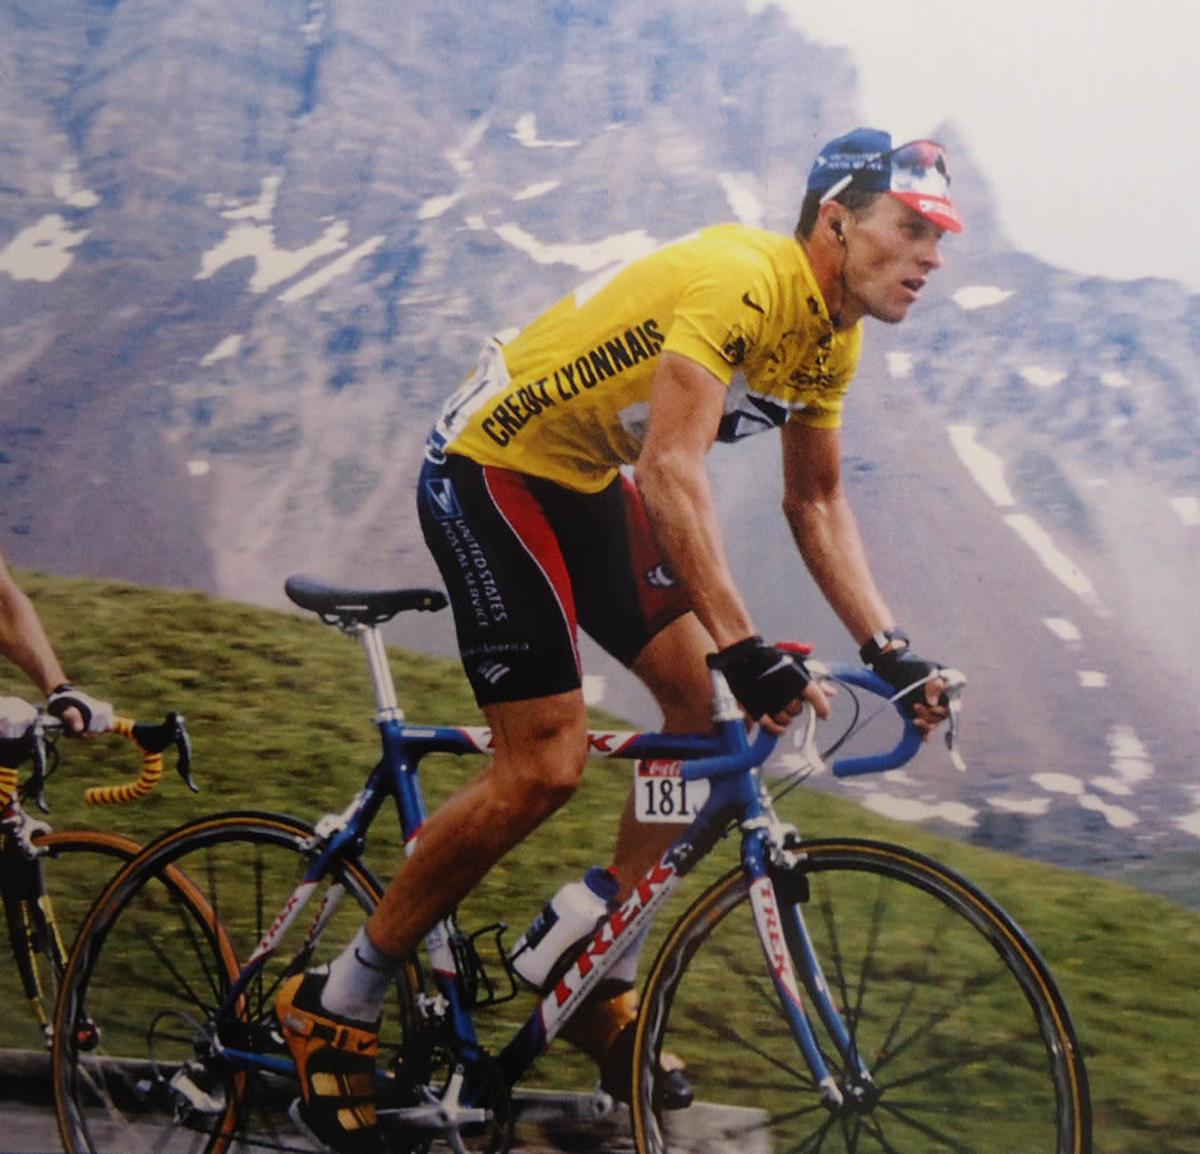 Armstrong Tour 99